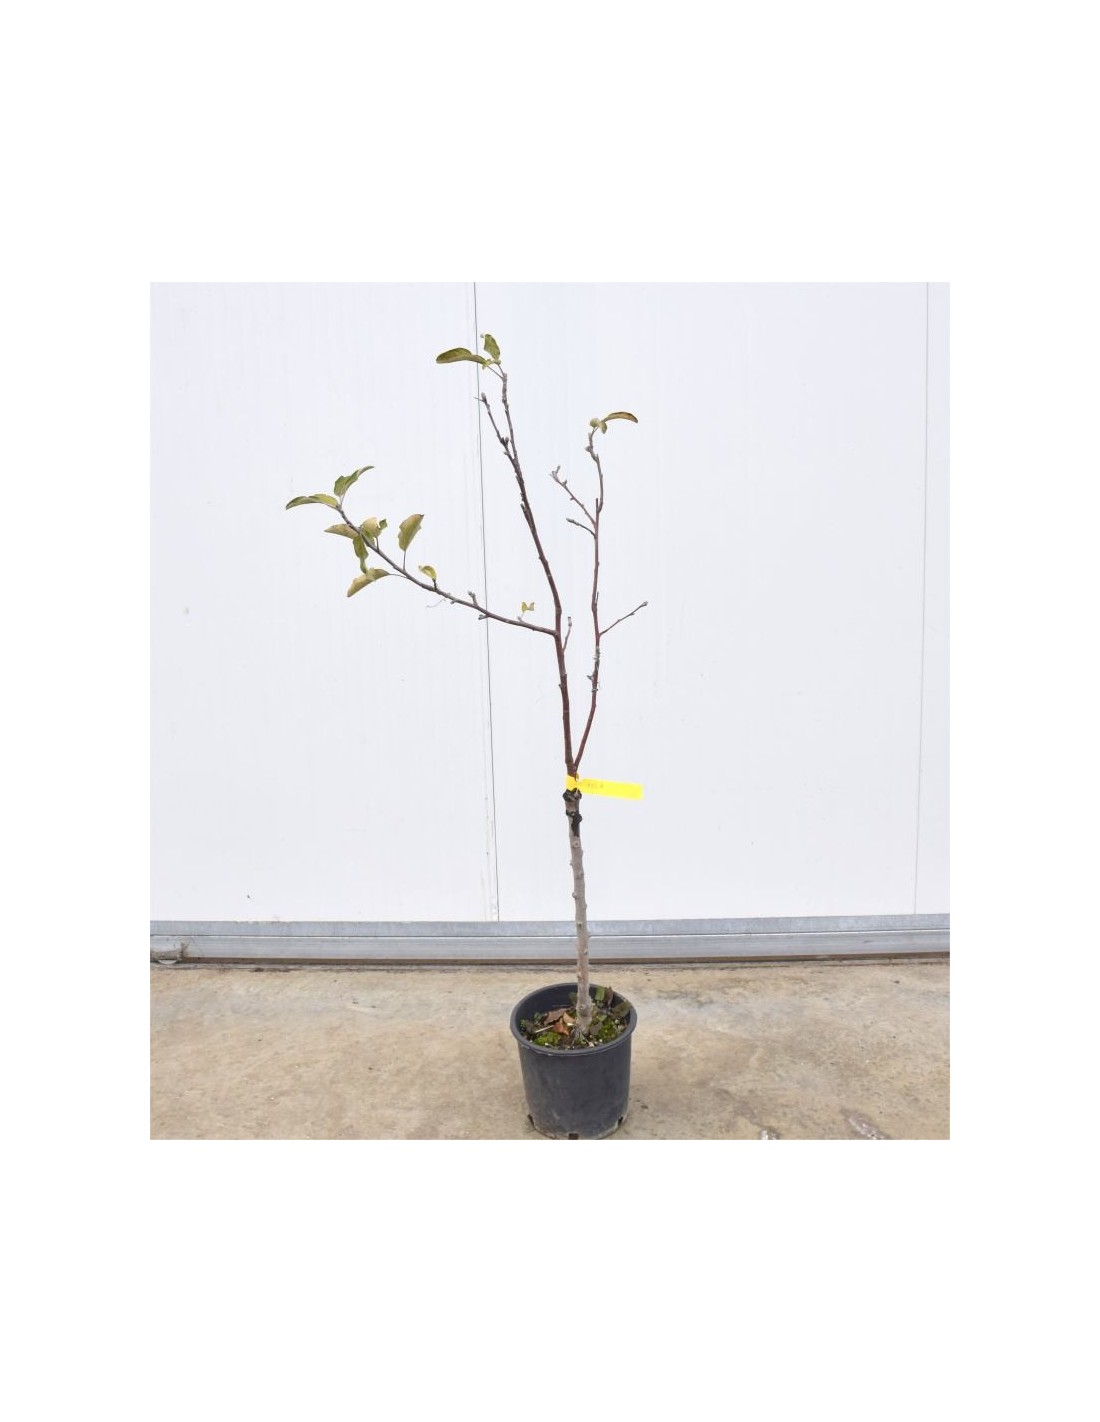 Piante Da Frutto Sempreverdi vendita mix di alberi da frutto-alberi da frutto online|mondo piante